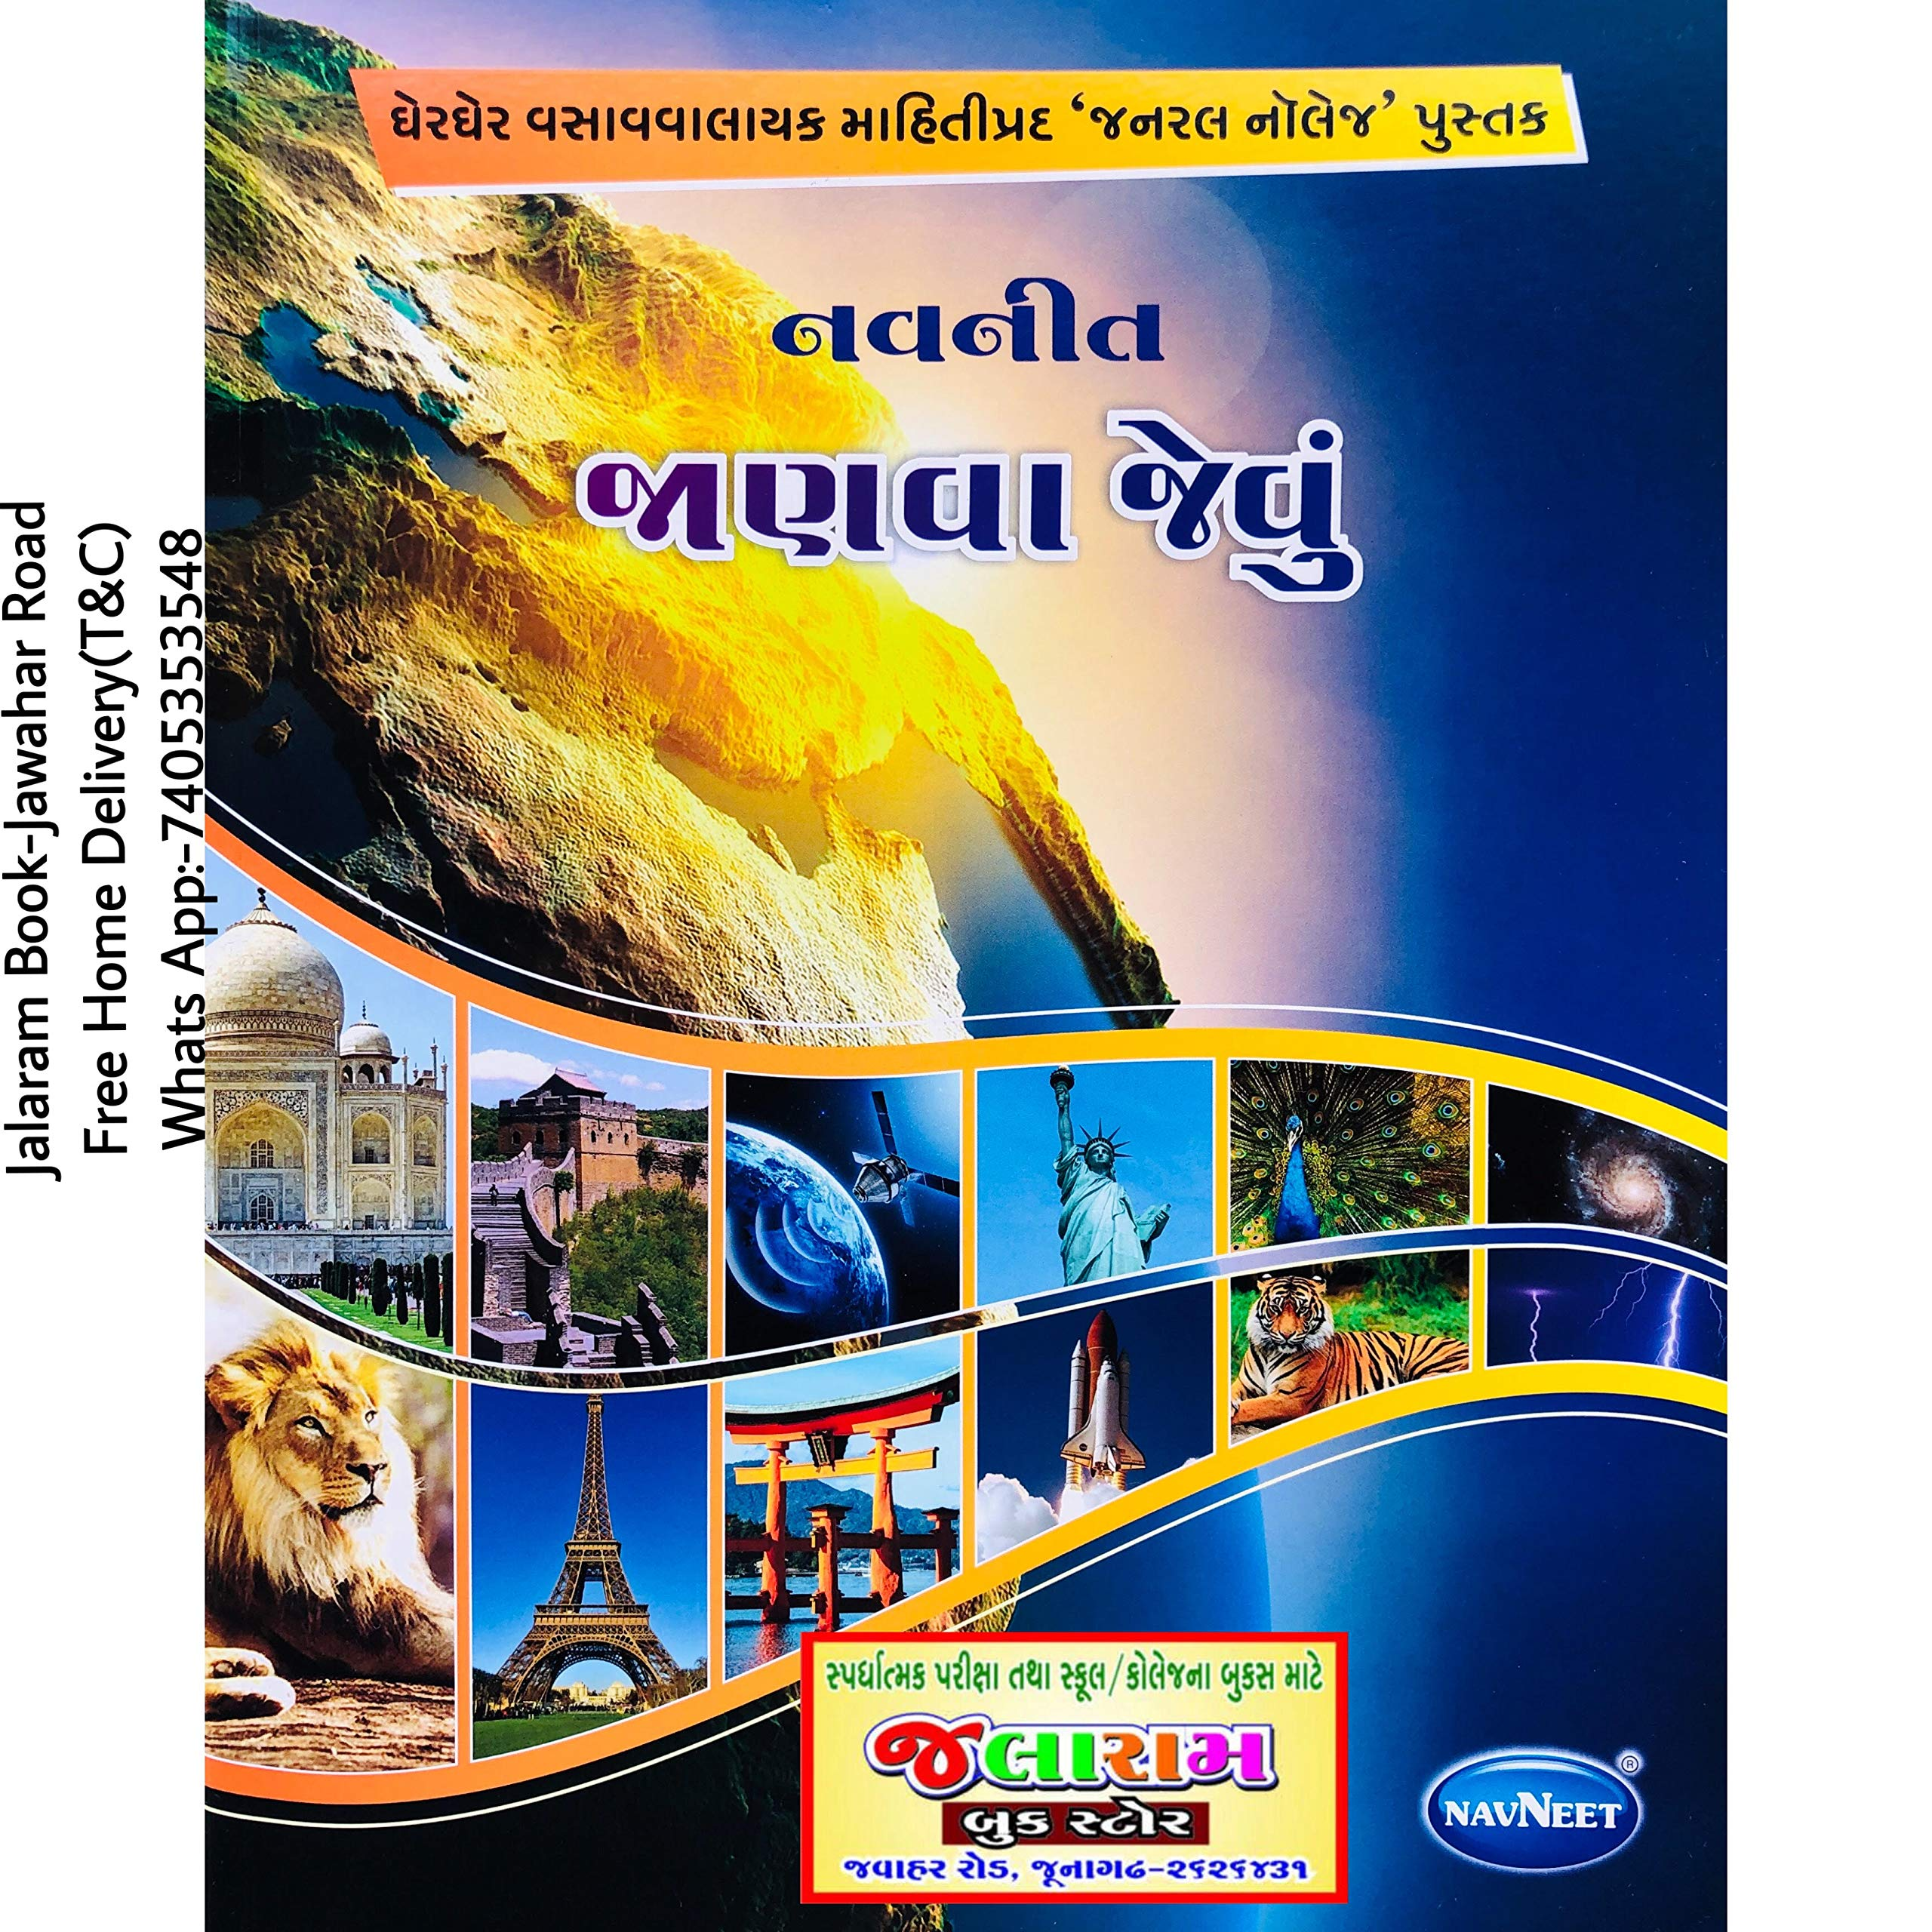 General 2013 pdf knowledge book gujarati navneet